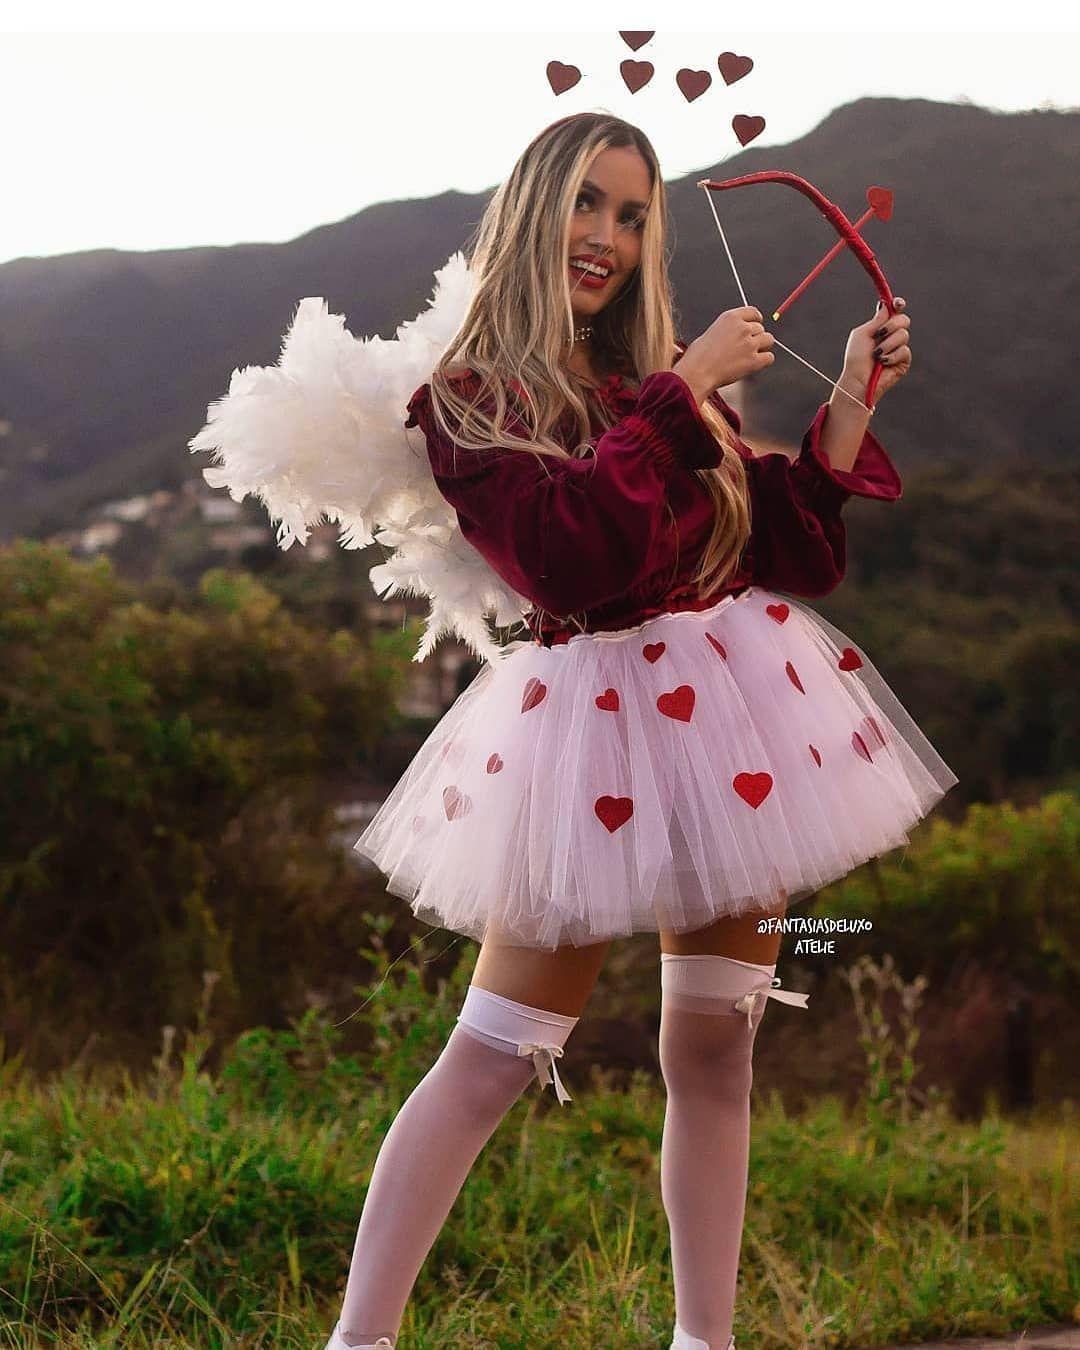 "Ateliê de fantasias on Instagram: ""Do you want to fall in love? � Coleção Angels #cupidlove #cupido #cupidcostume #Halloween #halloween2019 #fantasiadecupido…"""